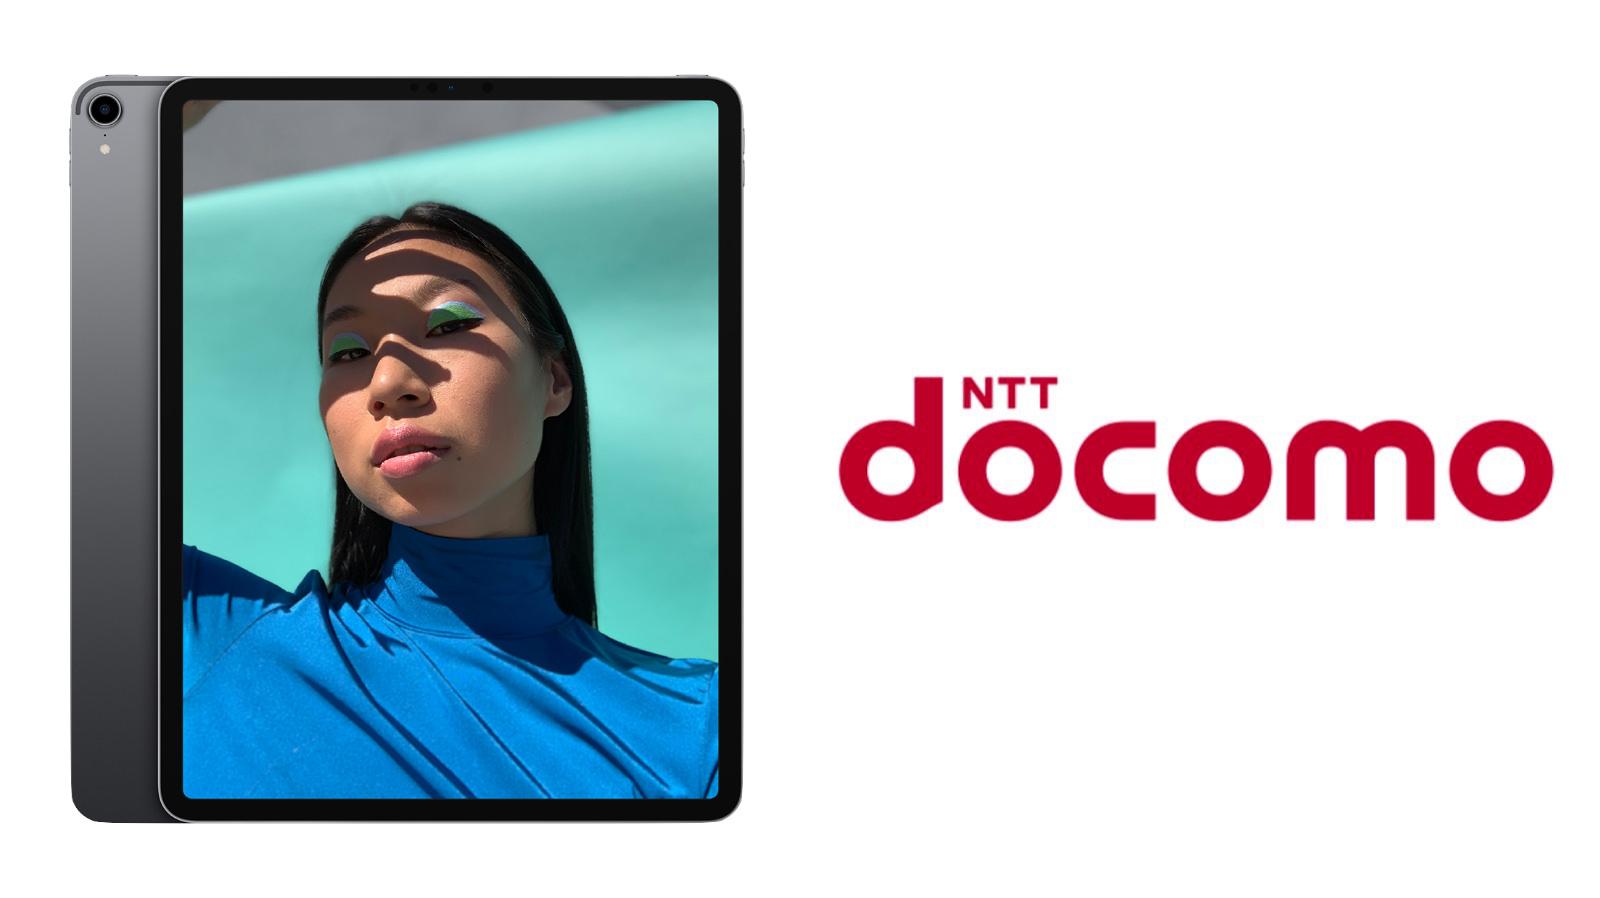 Docomo Pring for ipad pro 2018